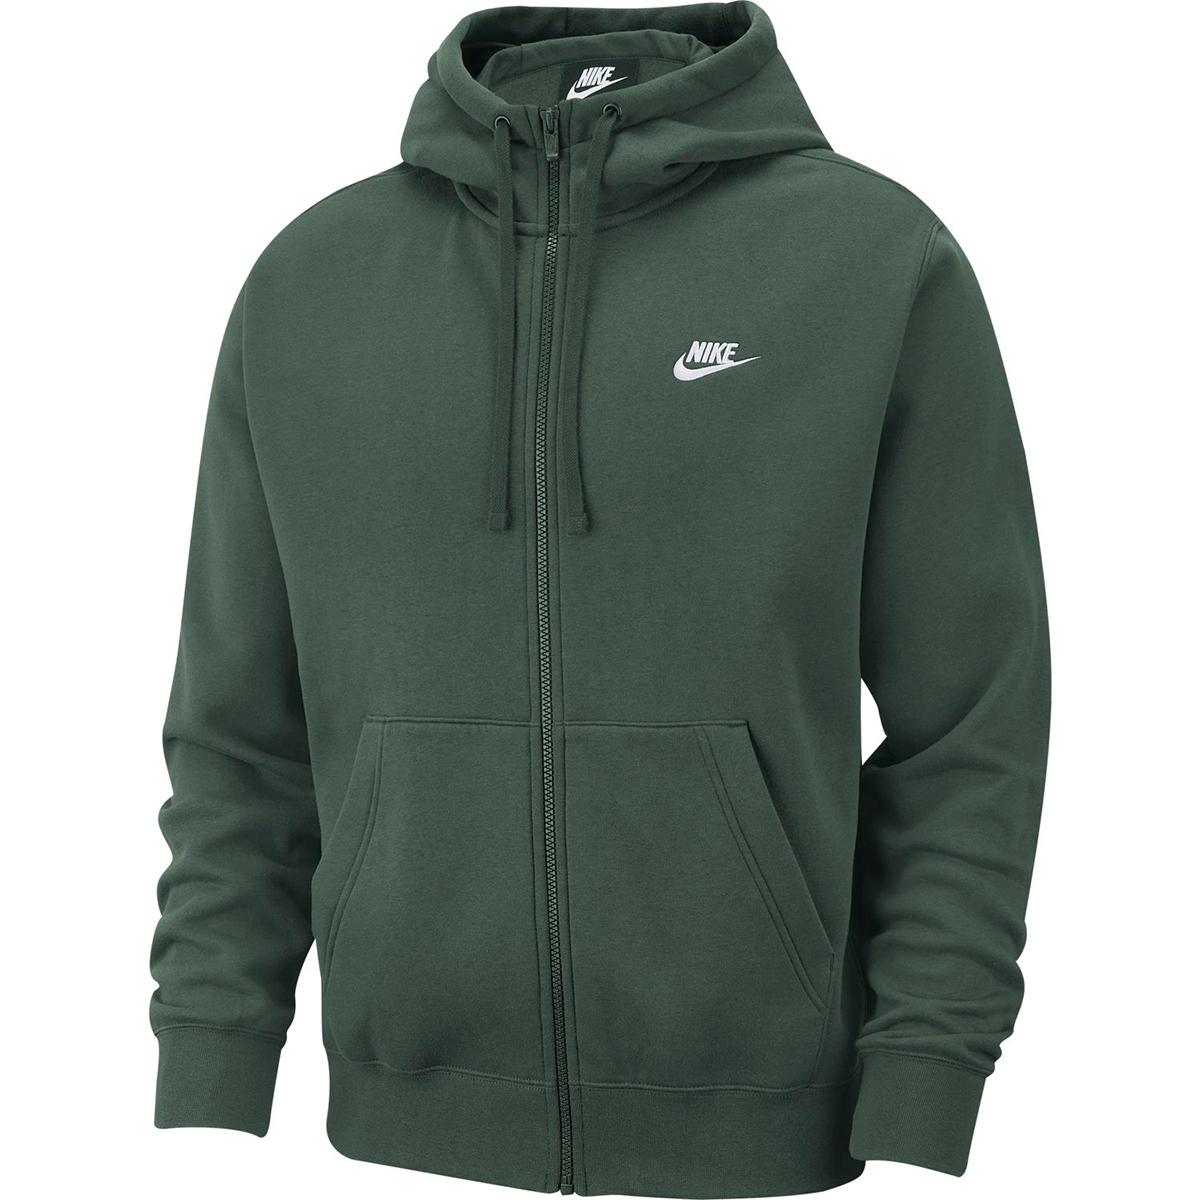 Nike Men's Full-Zip Nike Swoosh Hoodie - Green, L